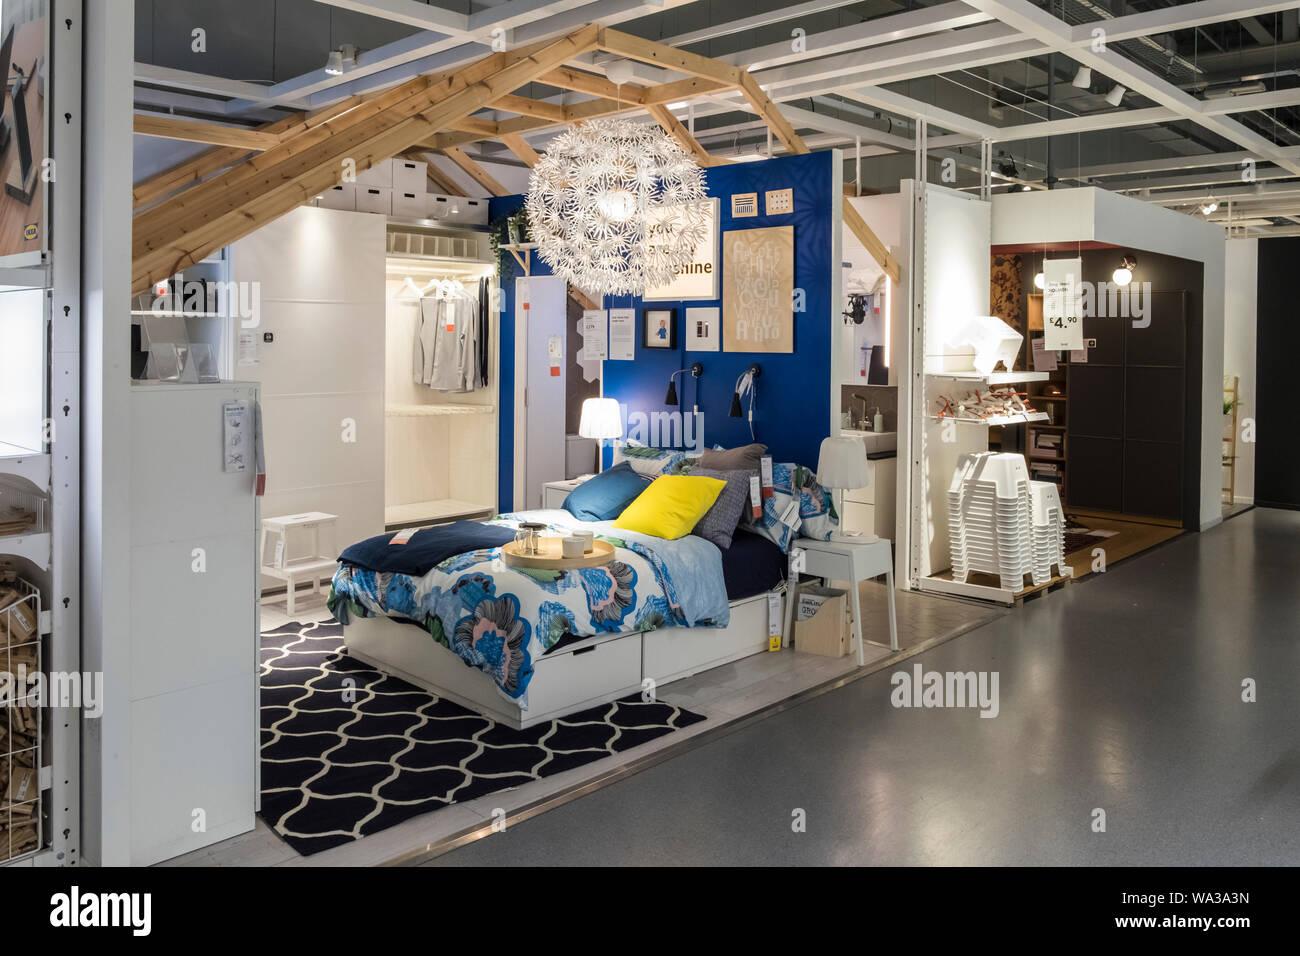 Ikea Room Display Set In Ikea Store Stock Photo Alamy